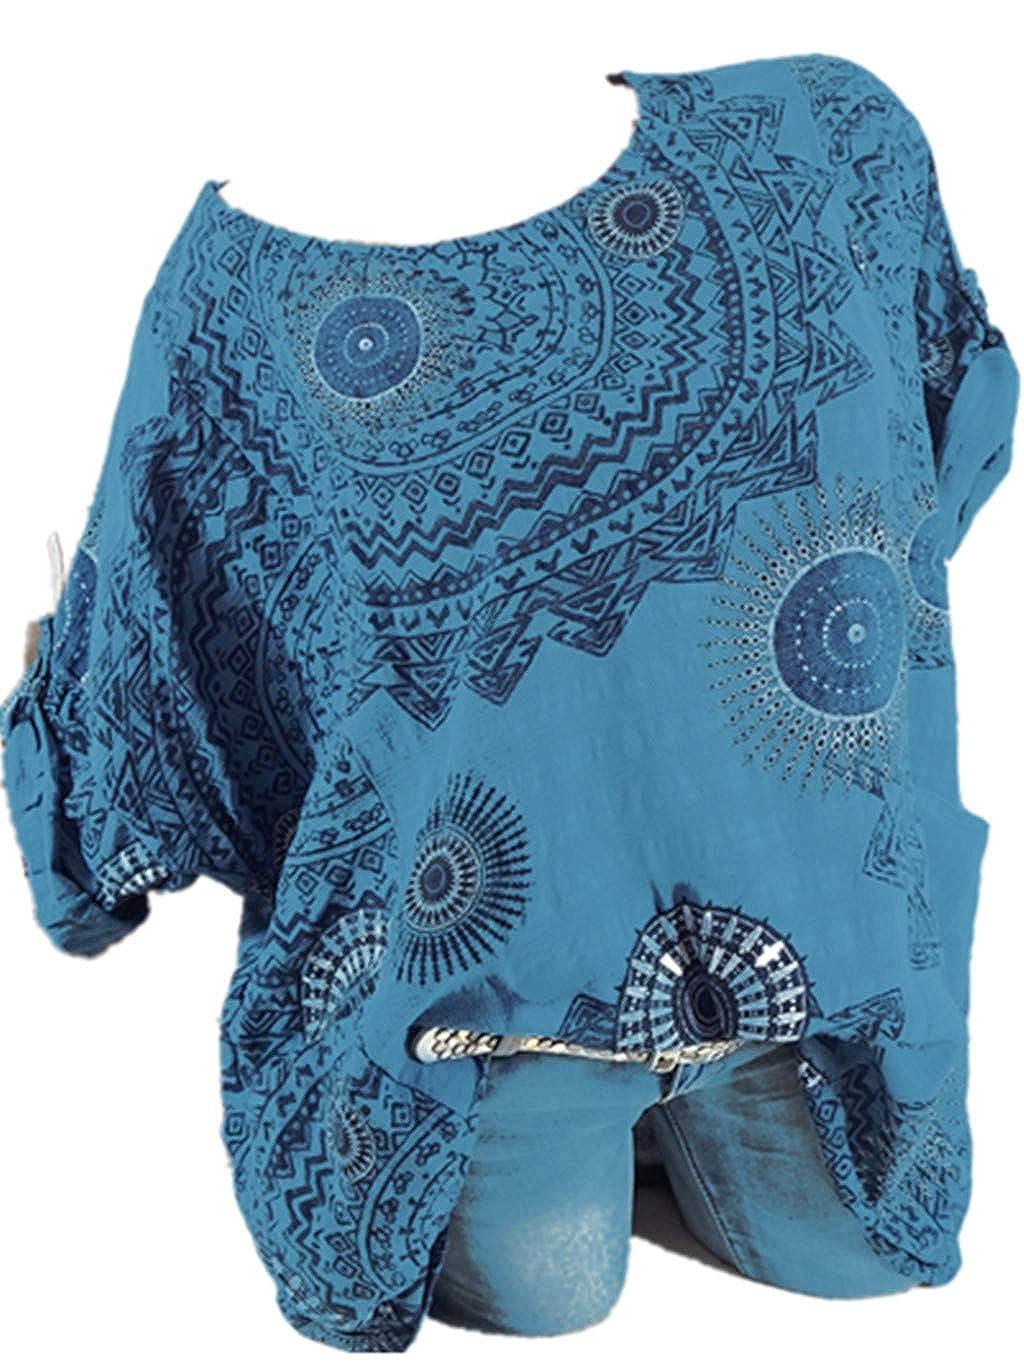 Yvelands Frauen Plus Größe Dreiviertel Ärmel Print V-Ausschnitt Bluse Pullover Tops Shirt